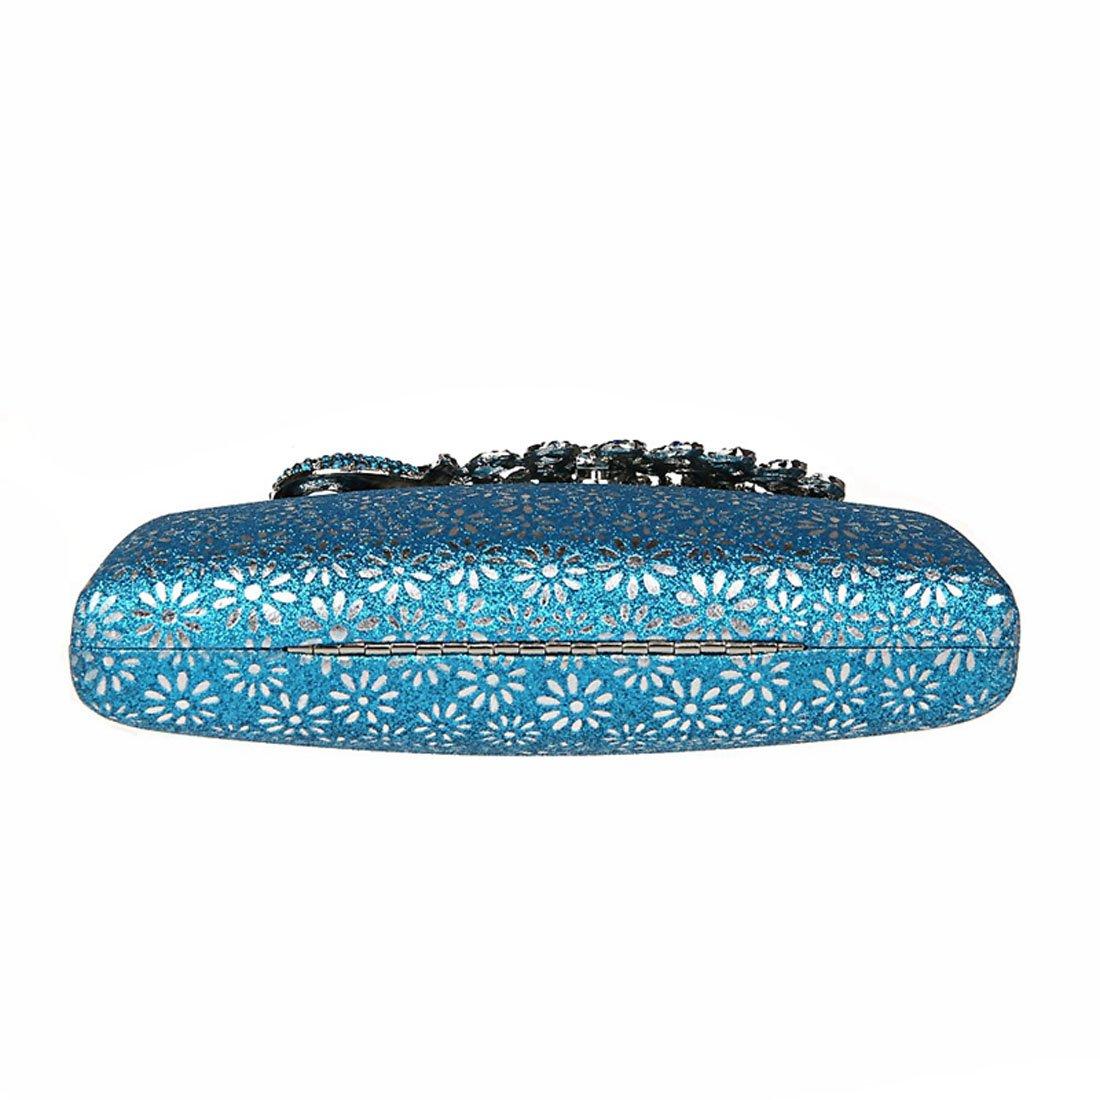 9143d877c0725 KAXIDY Damen Handtasche Clutch Glänzende Pfau-Kristall Buckle Damentasche  Tasche Abend Handtasche Abendtasche (Blau)  Amazon.de  Koffer